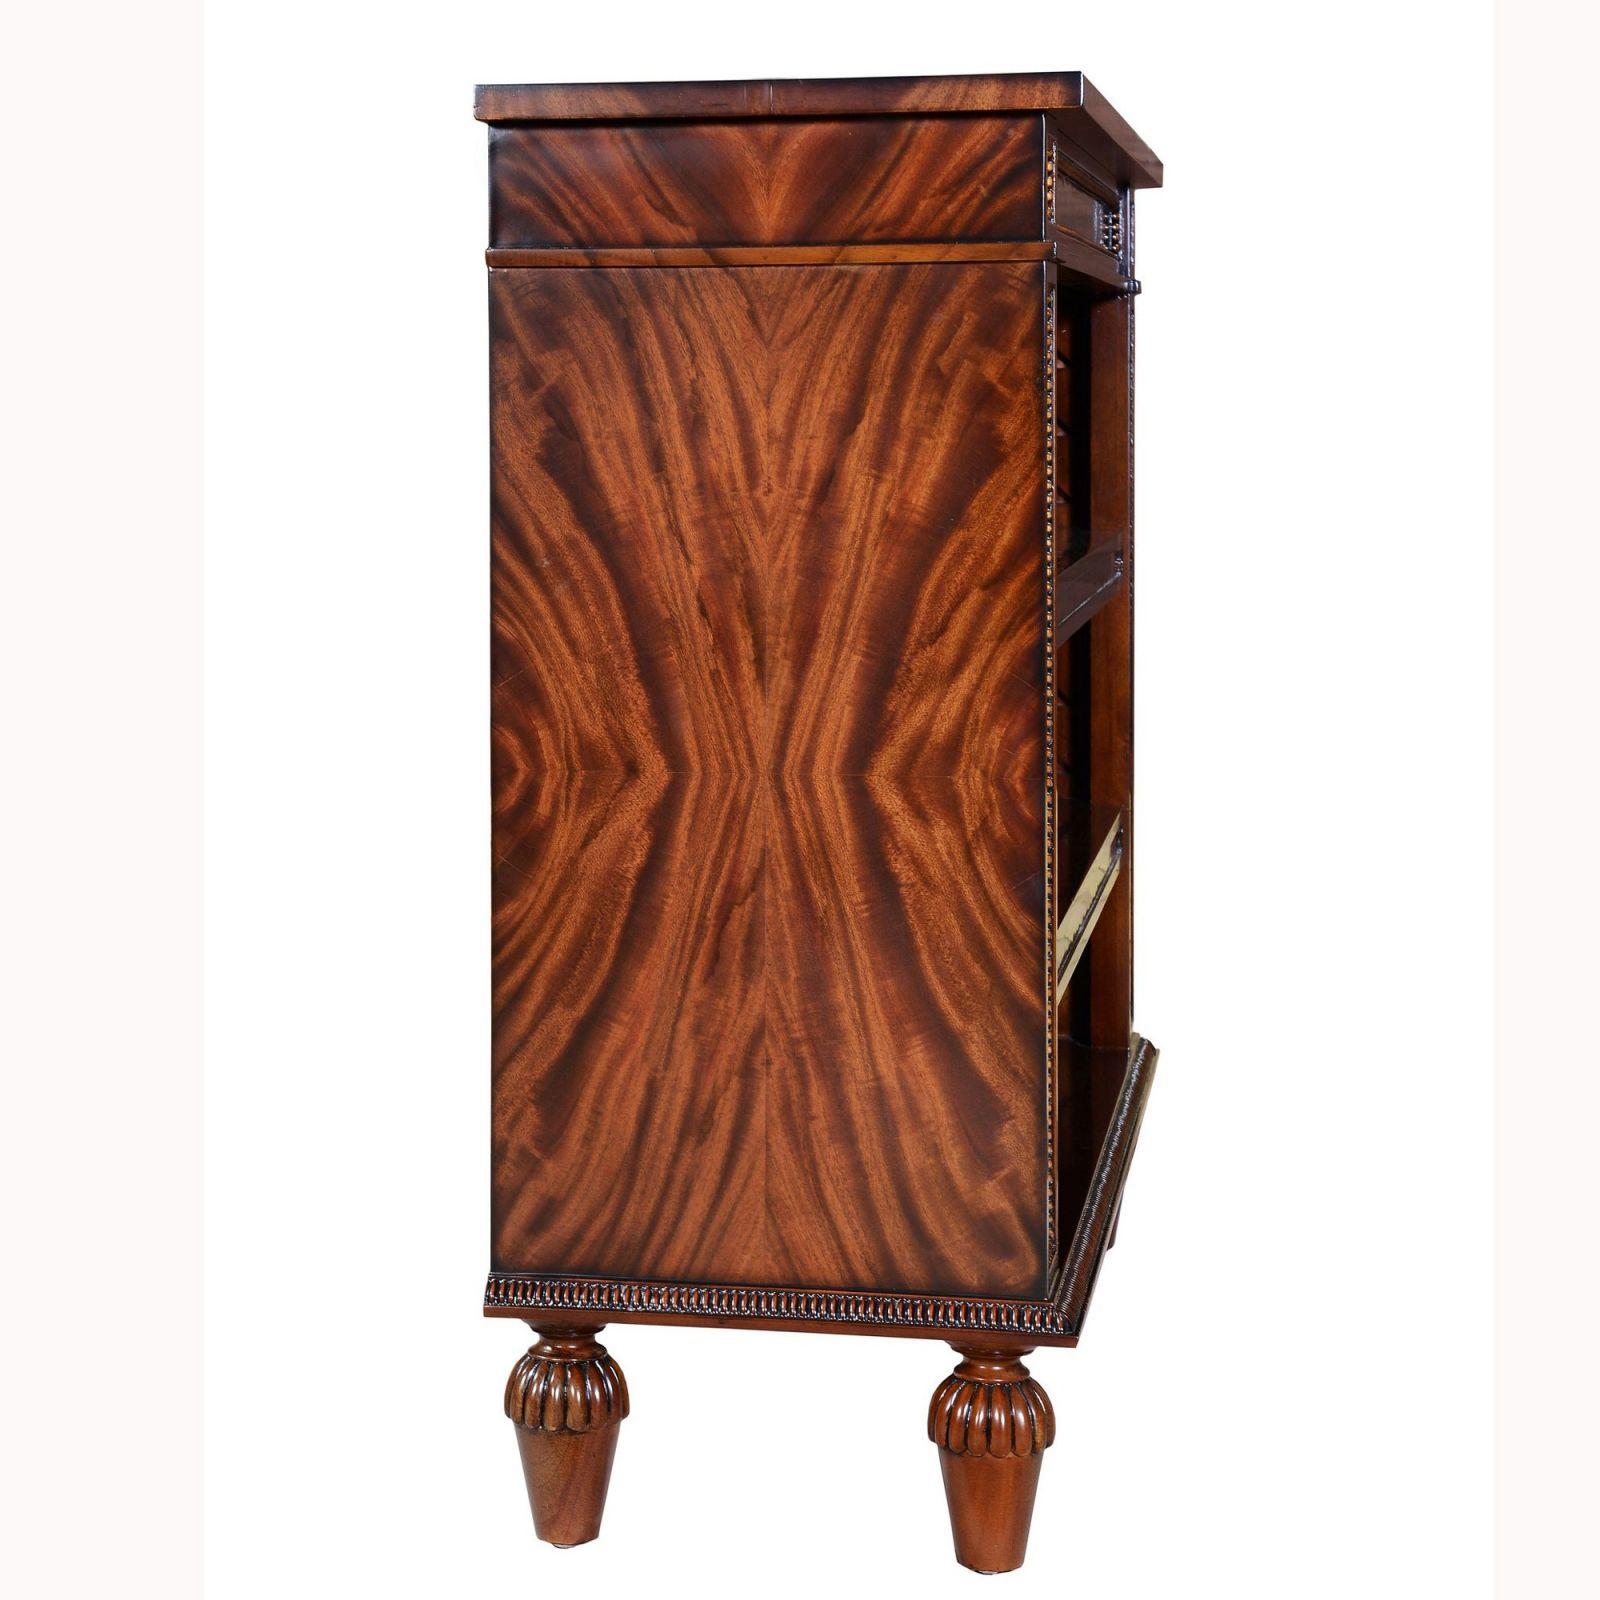 Regency Style Mahogany open Bookcase - 42in